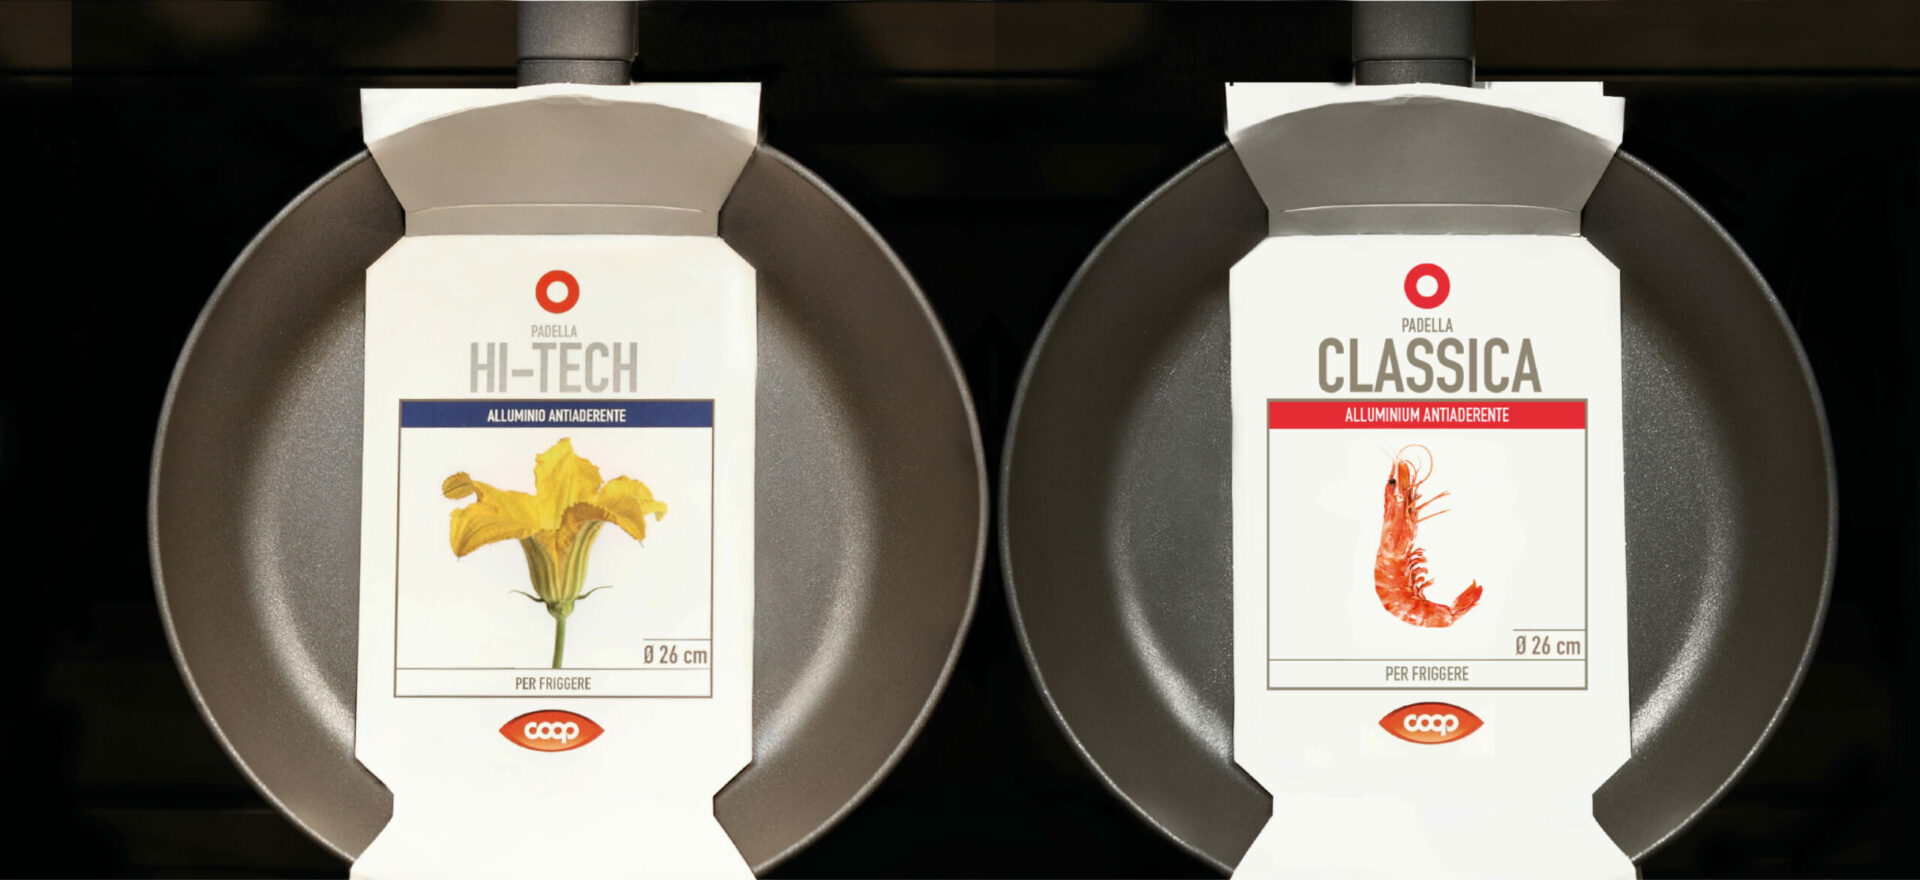 Frying pan packaging   Graphic Design   Branding   Coop Italia  Mario Trimarchi Design   Fragile